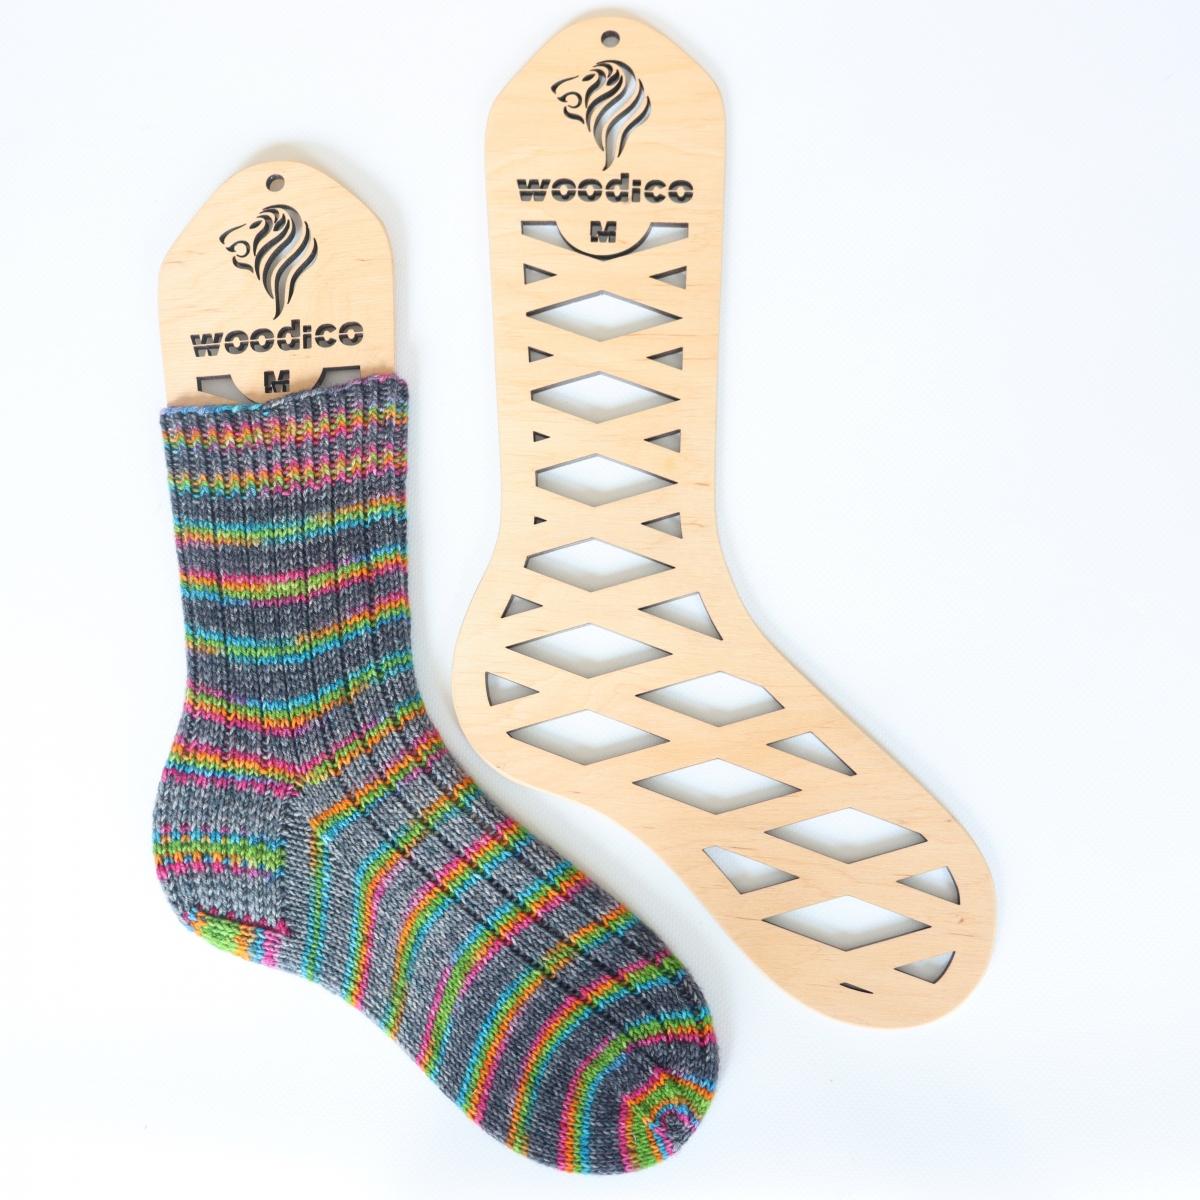 woodico.pro wooden sock blockers leo 16 1200x1200 - Wooden sock blockers / Leo